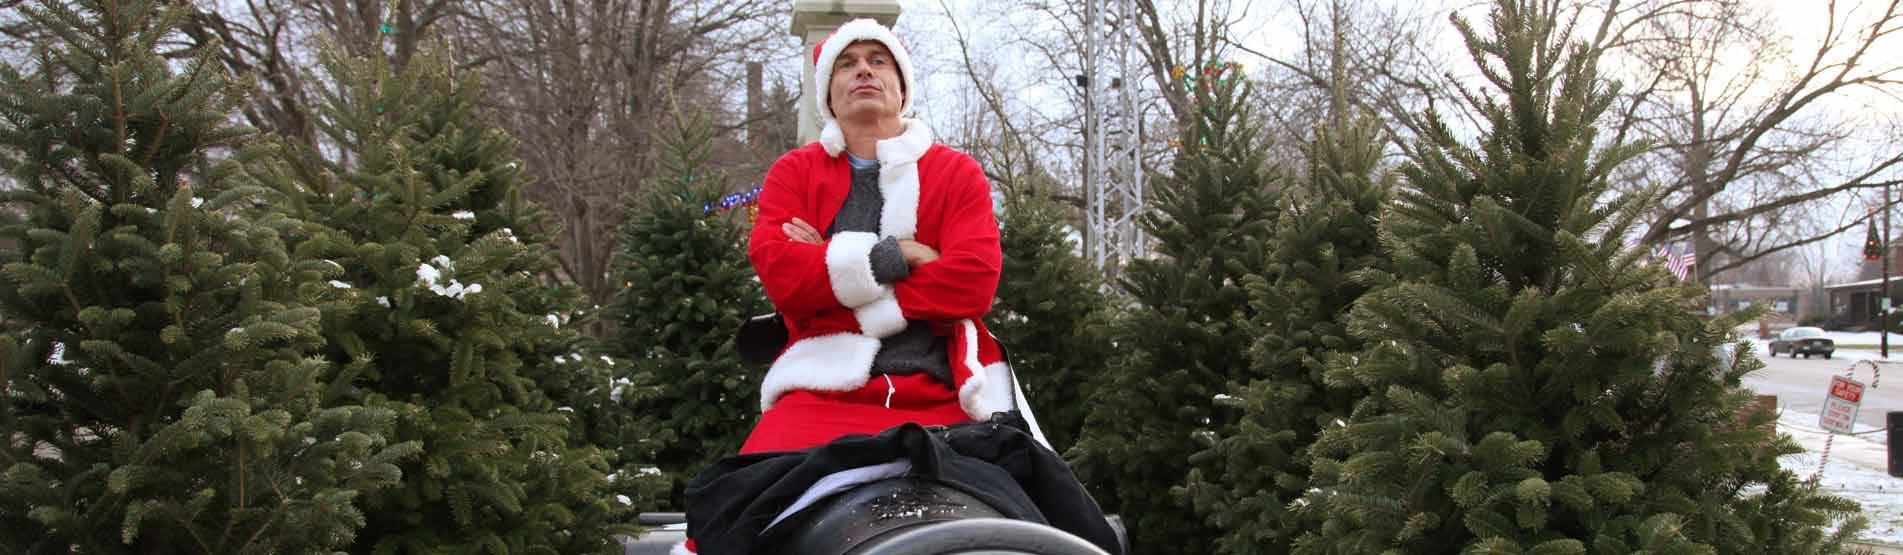 Božični izlet